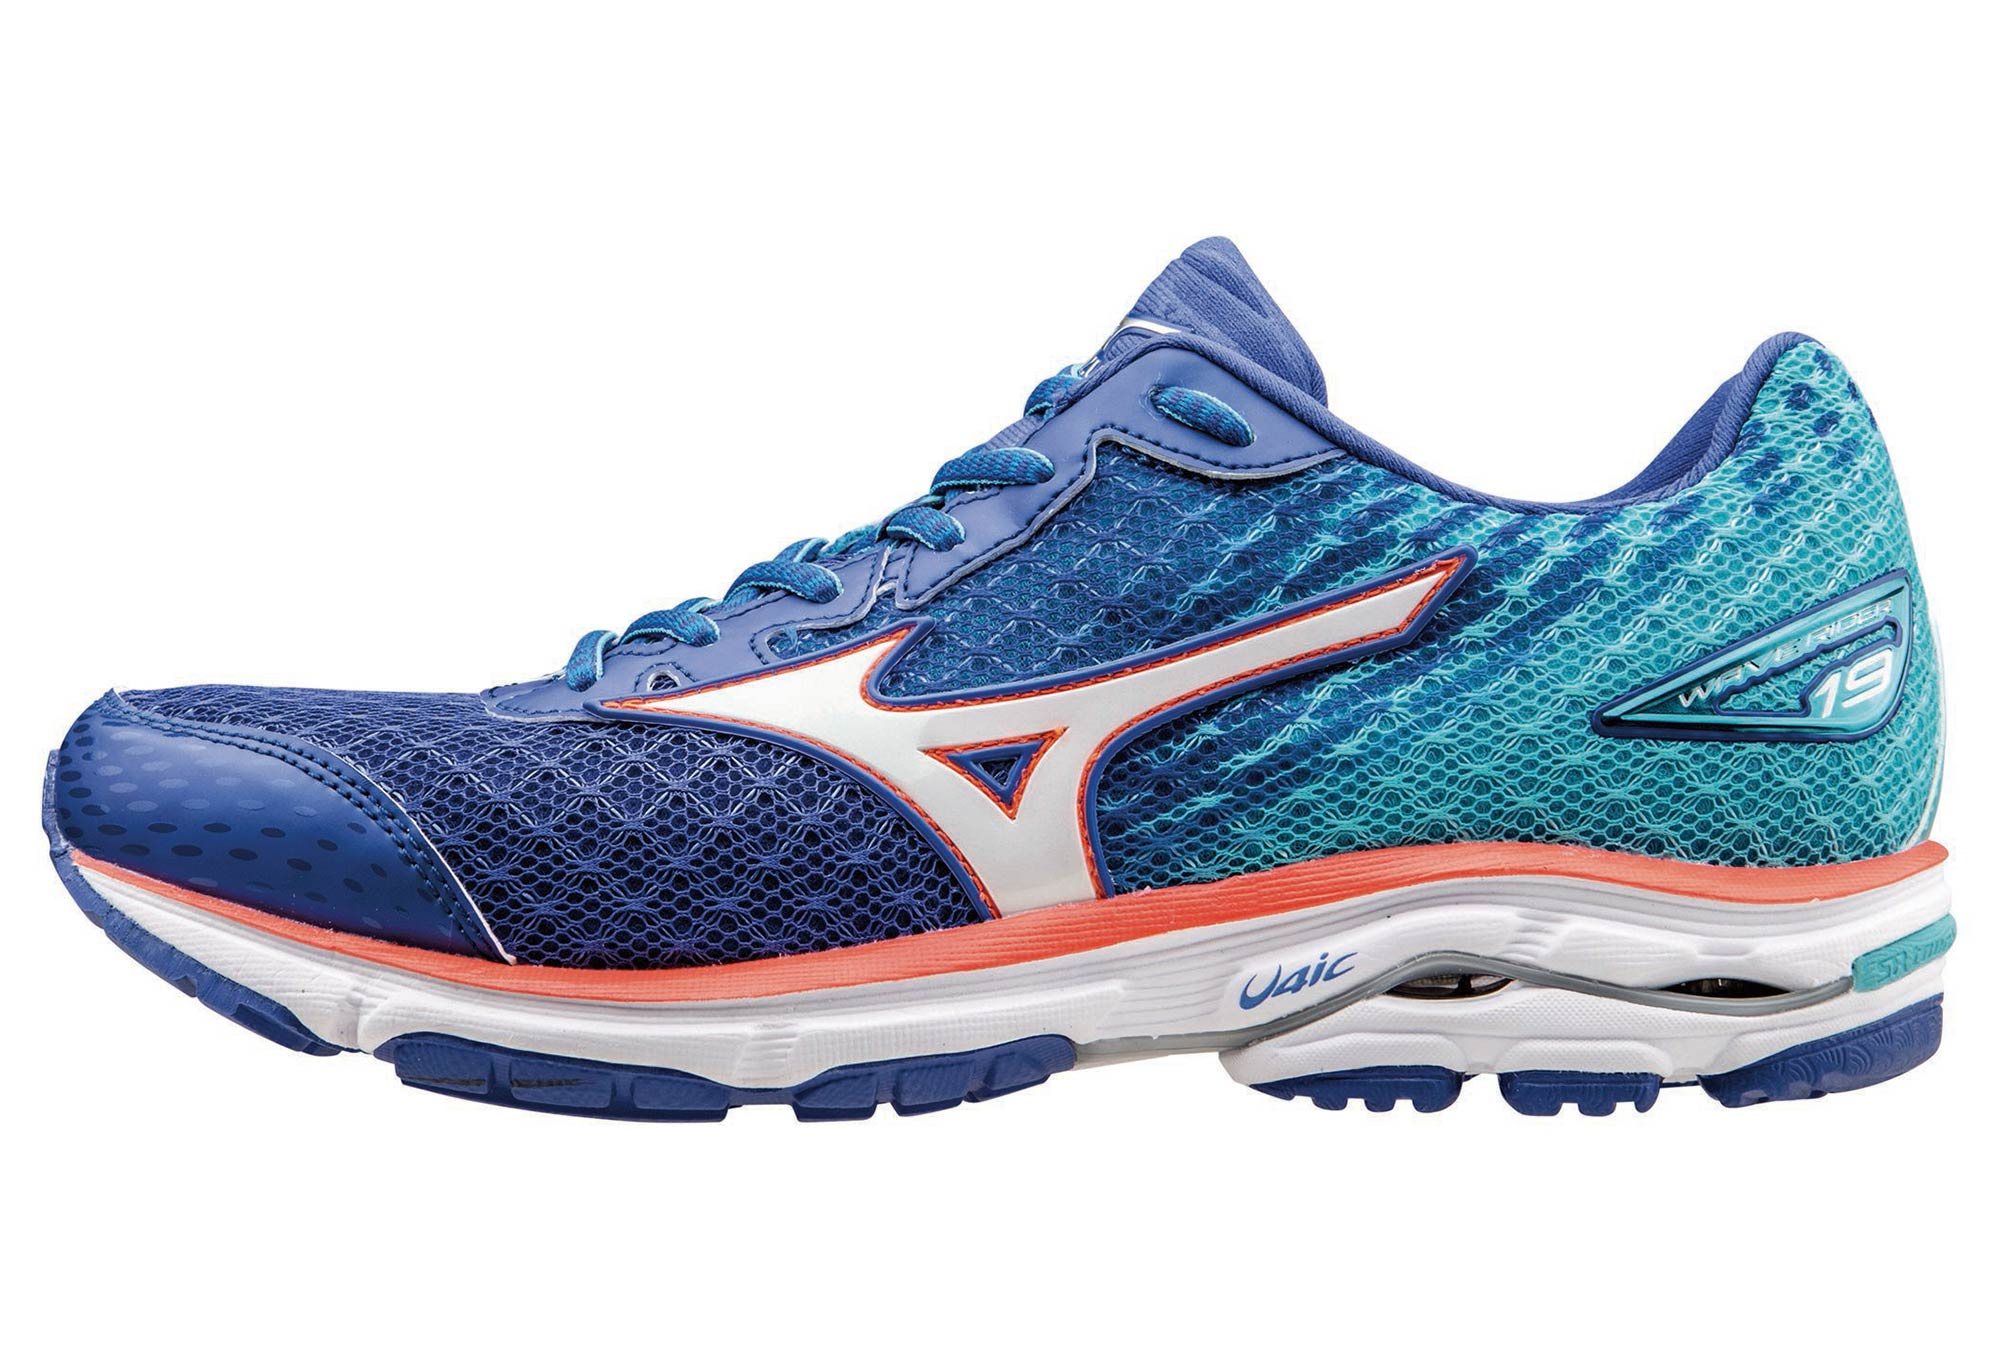 7f3aeccf7df Chaussures de Running Femme Mizuno WAVE RIDER 19 Bleu